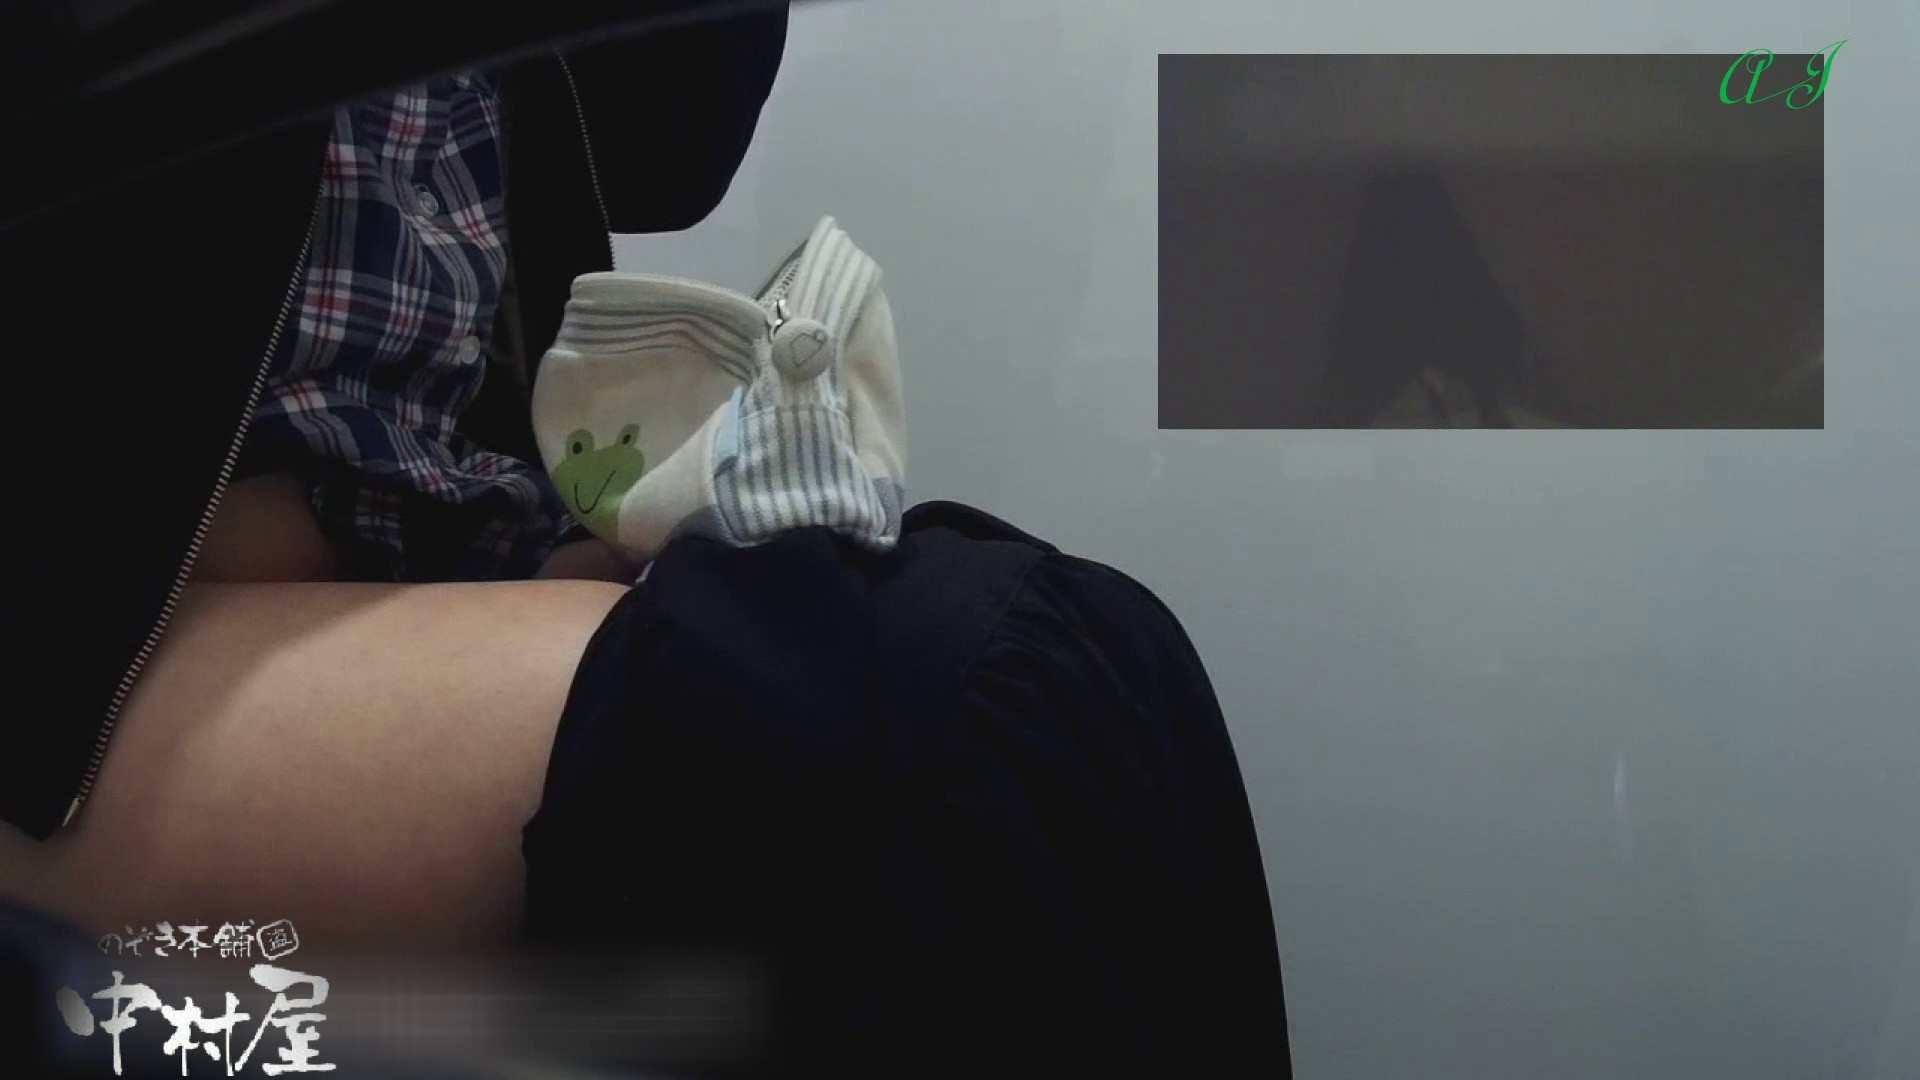 有名大学女性洗面所 vol.79 新アングル丸見え 前編 洗面所 | 丸見え  81連発 6